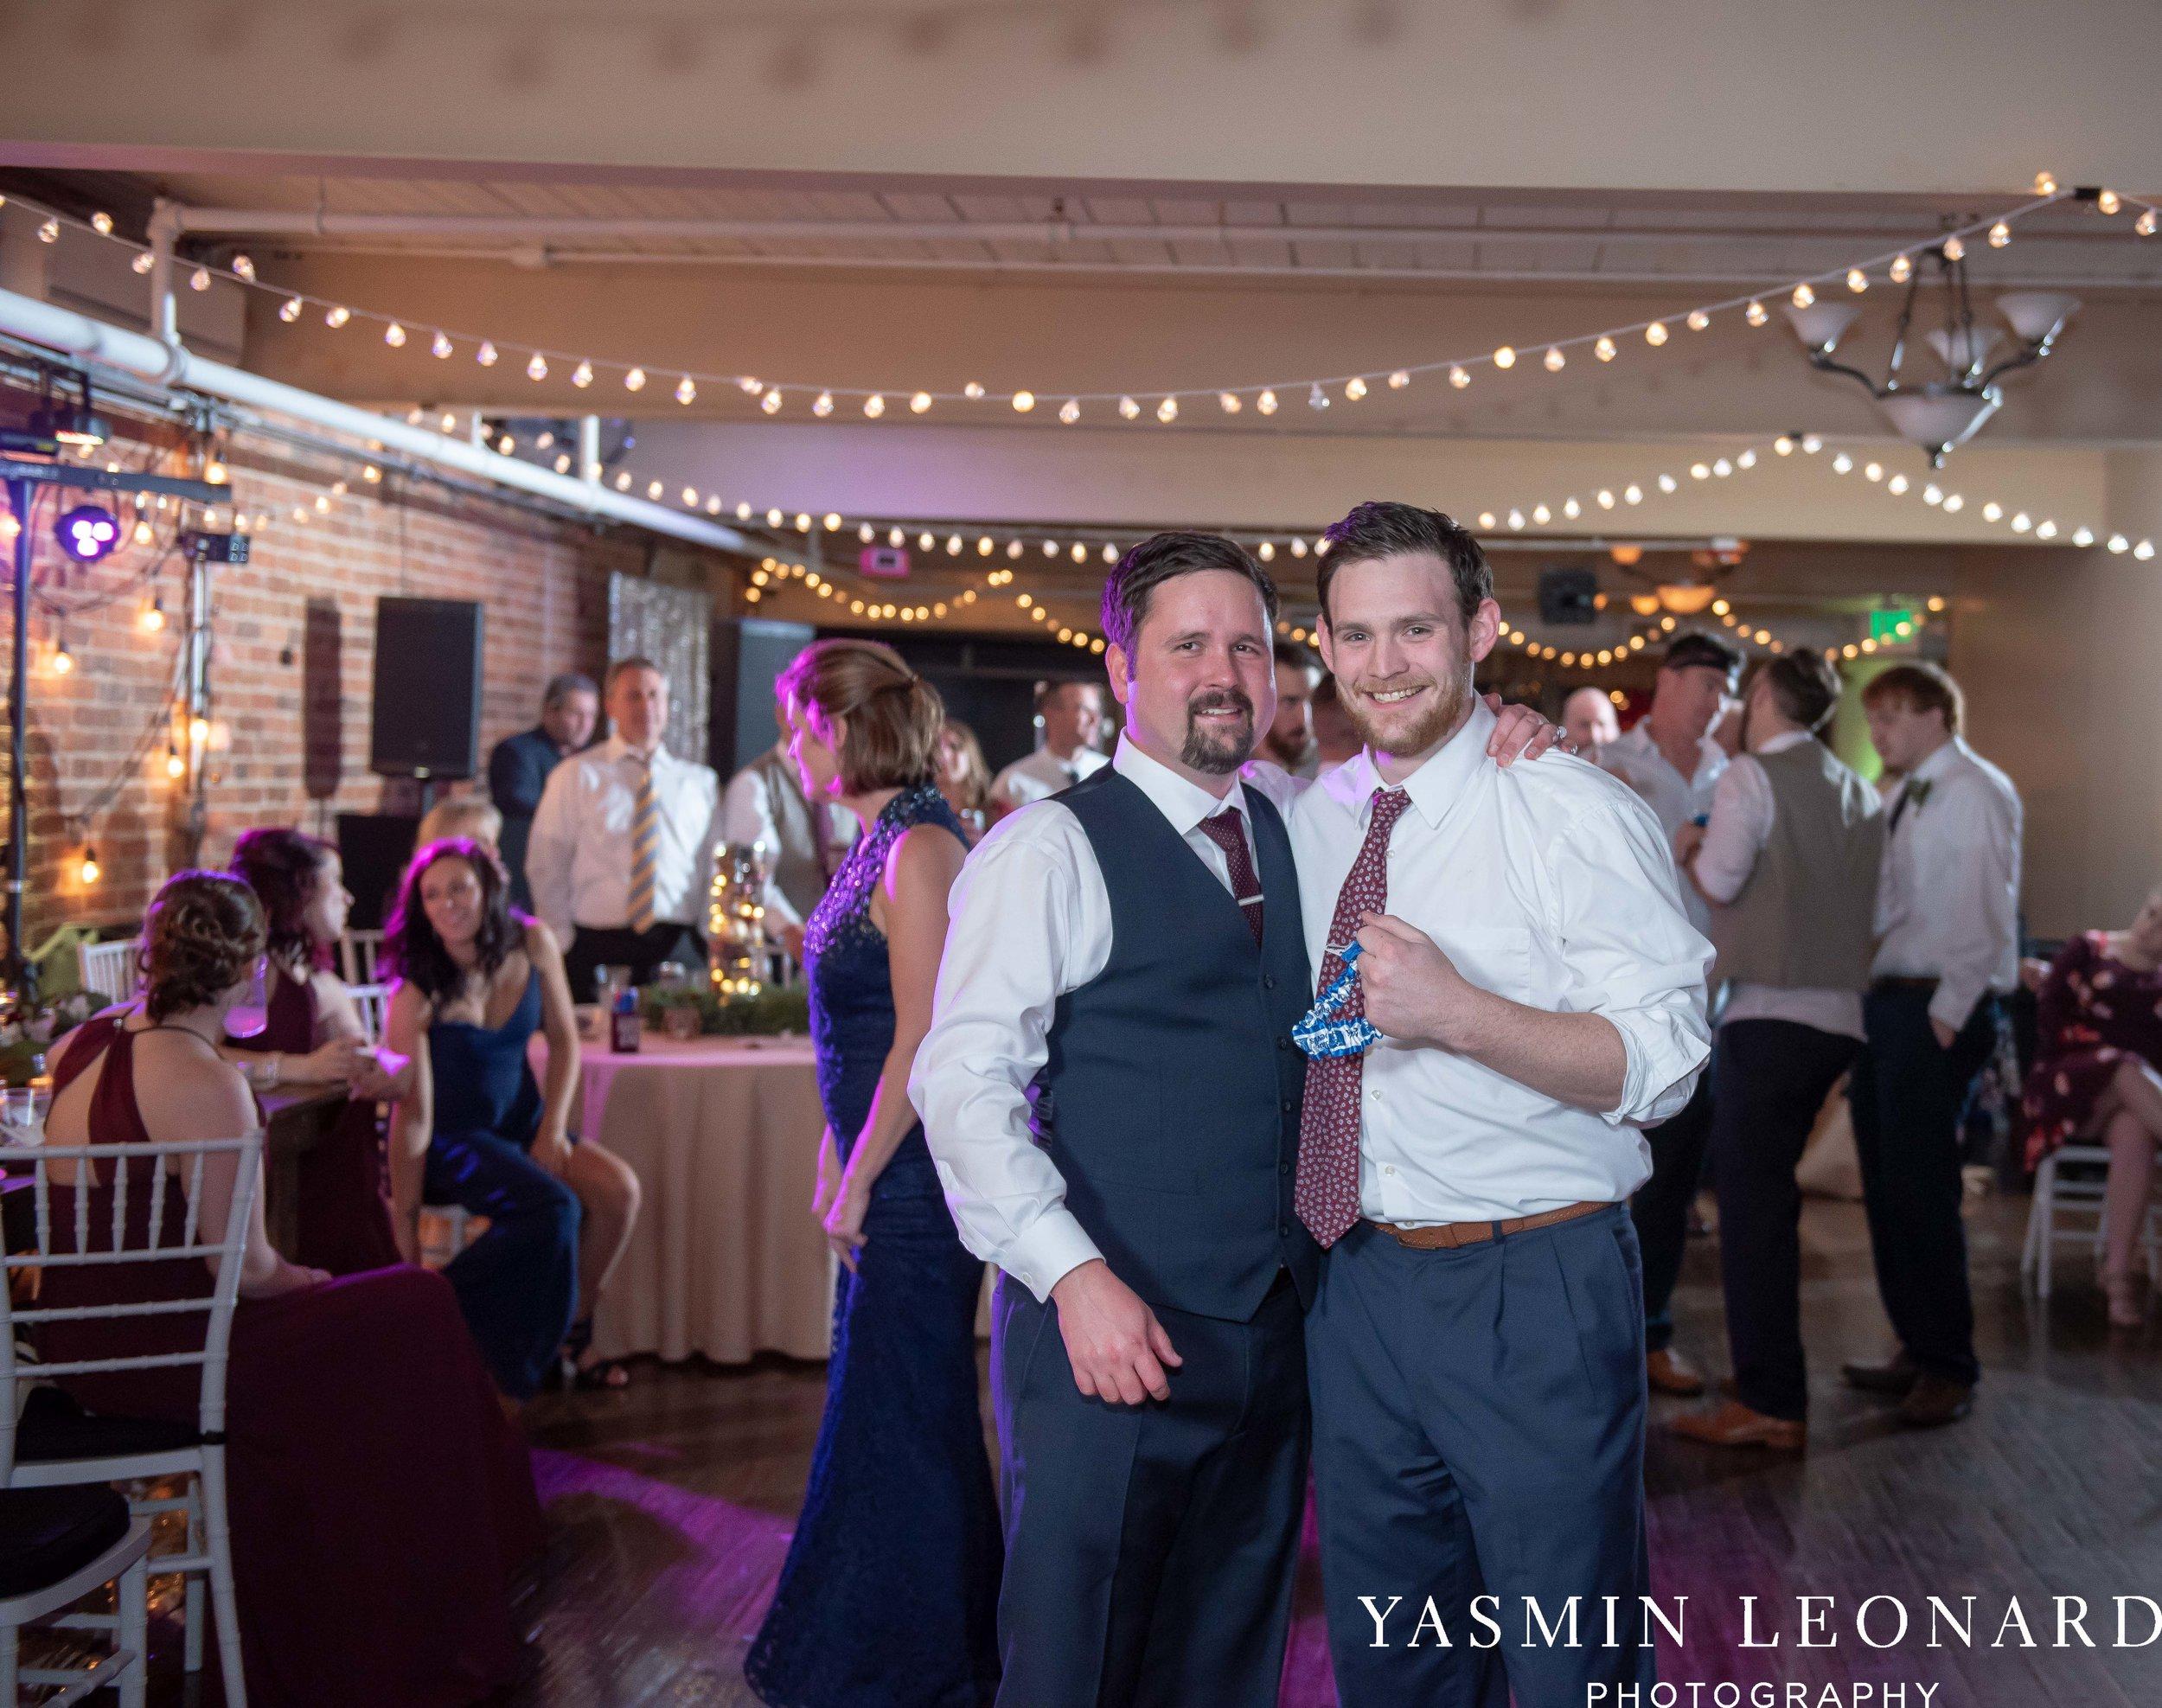 Rebekah and Matt - 105 Worth Event Centre - Yasmin Leonard Photography - Asheboro Wedding - NC Wedding - High Point Weddings - Triad Weddings - Winter Wedding-73.jpg